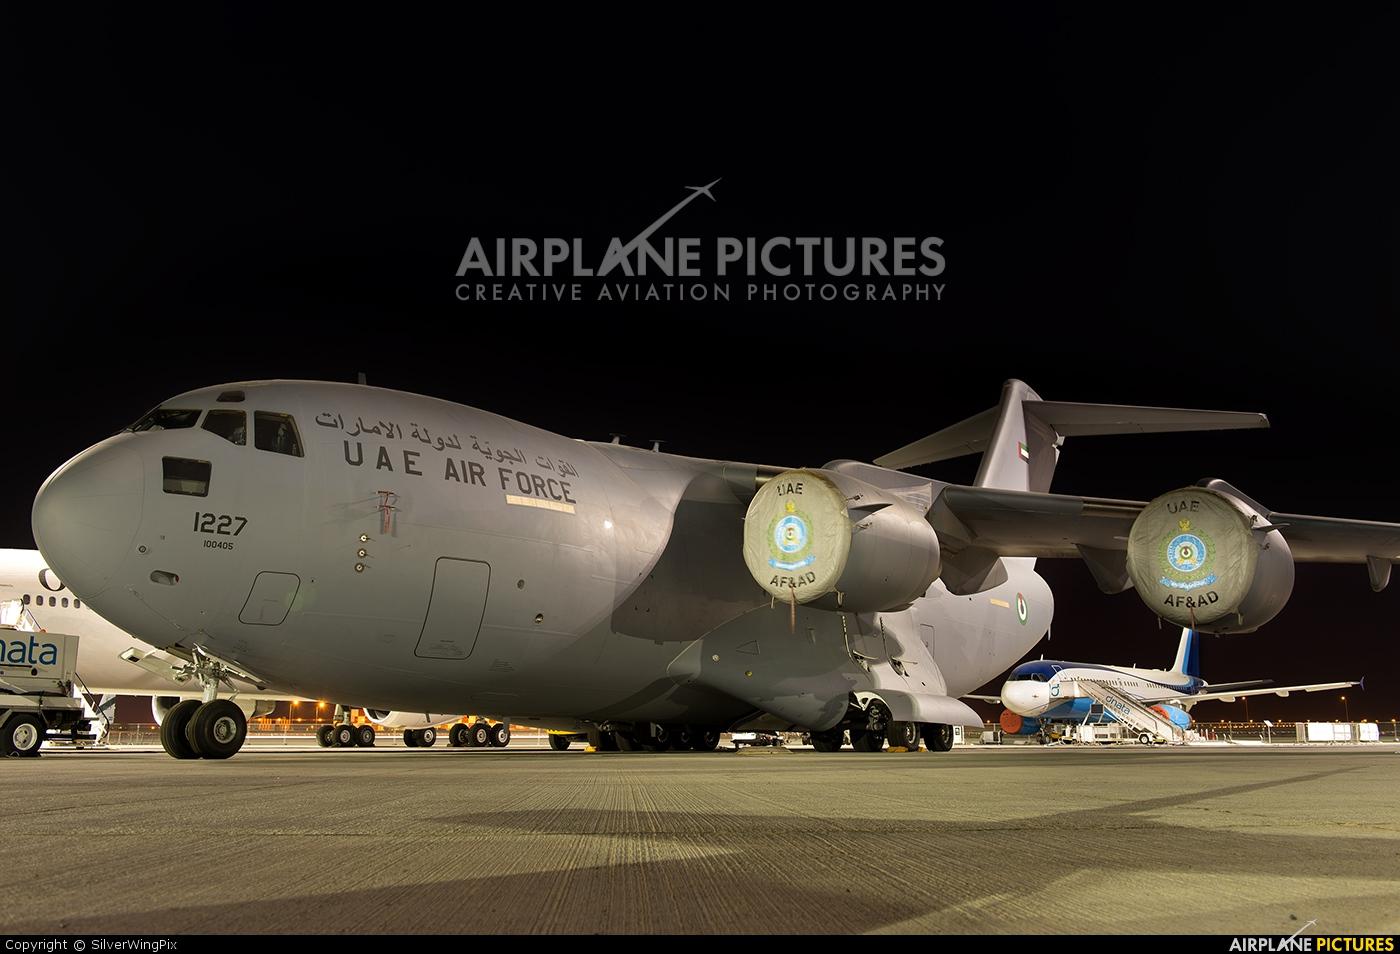 United Arab Emirates - Air Force 1227 aircraft at Jebel Ali Al Maktoum Intl